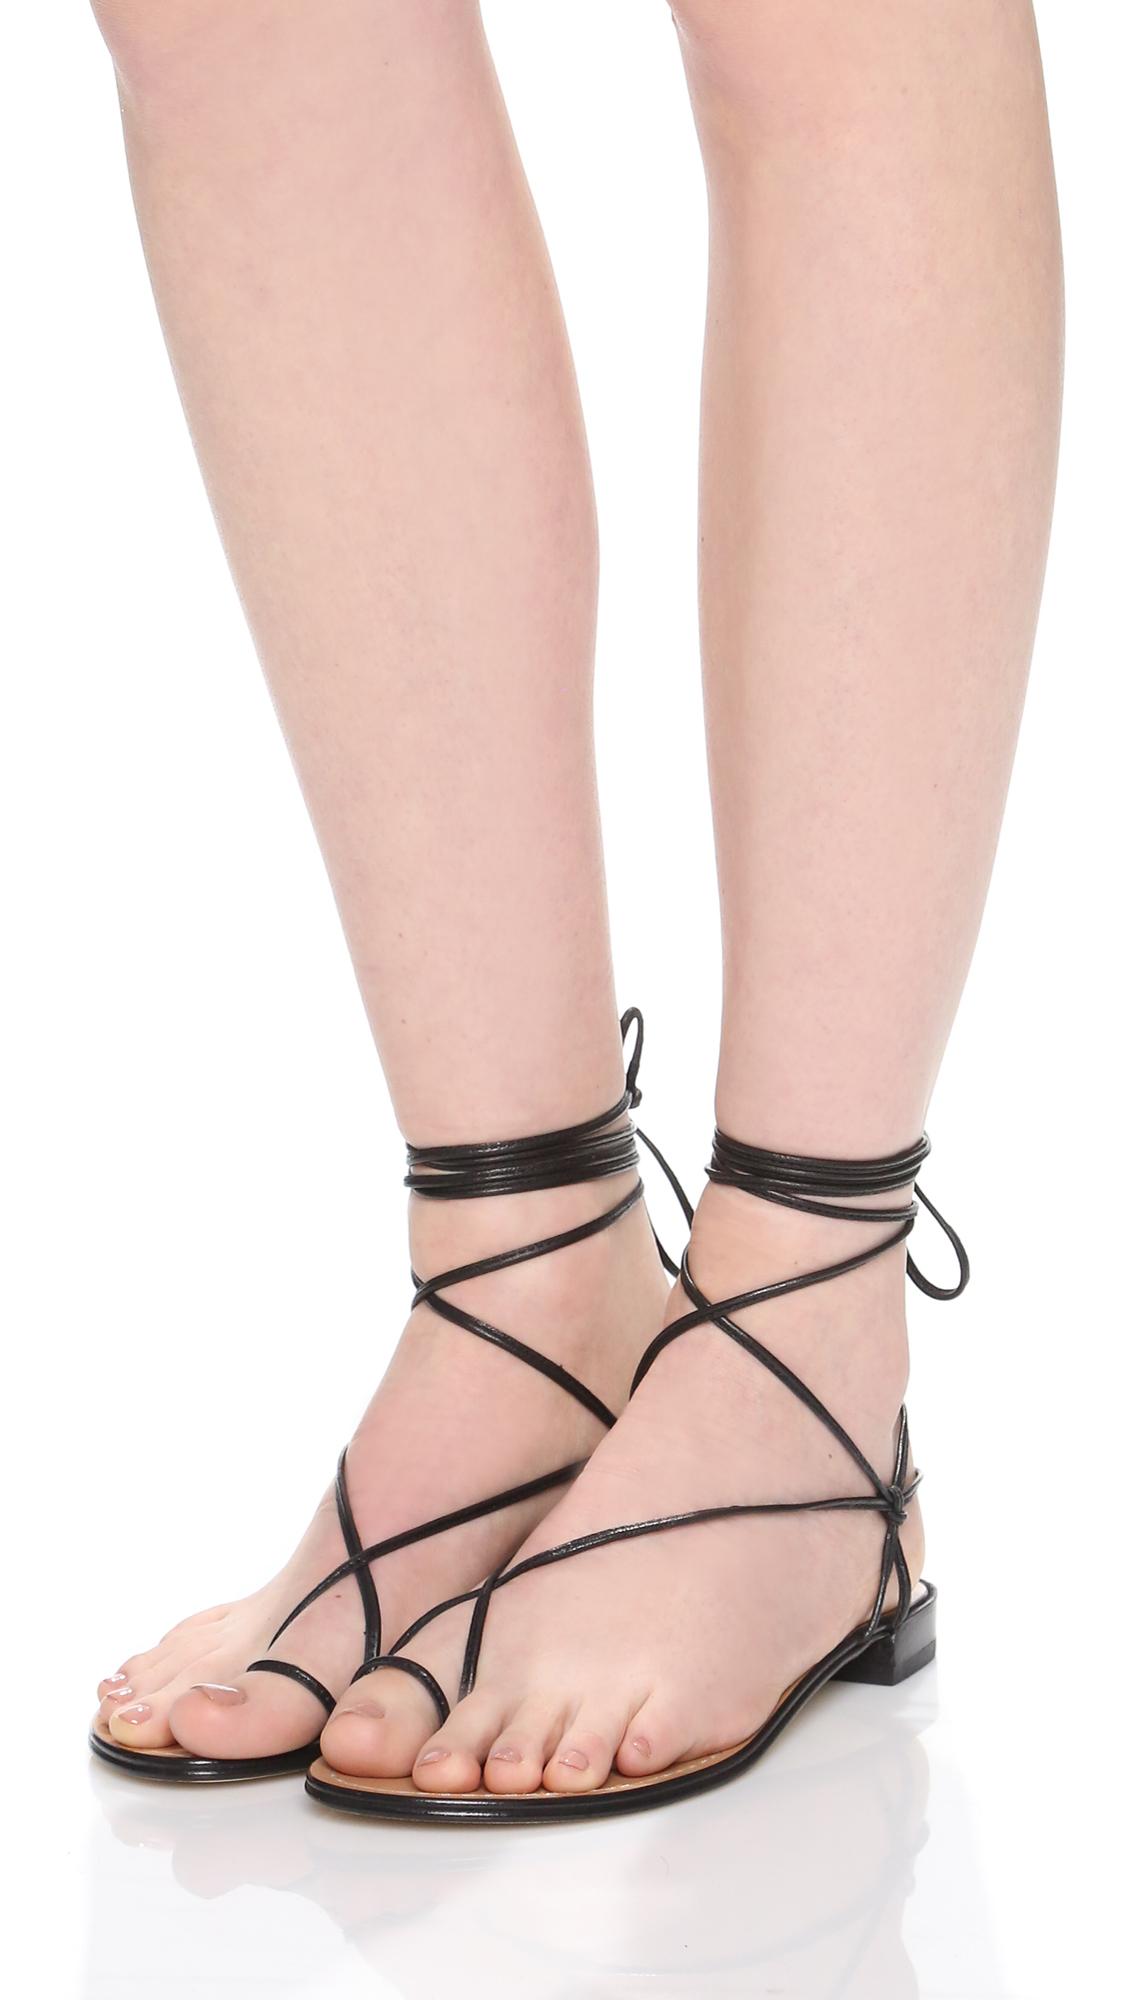 Lyst Stuart Weitzman Nieta Sandals In Black